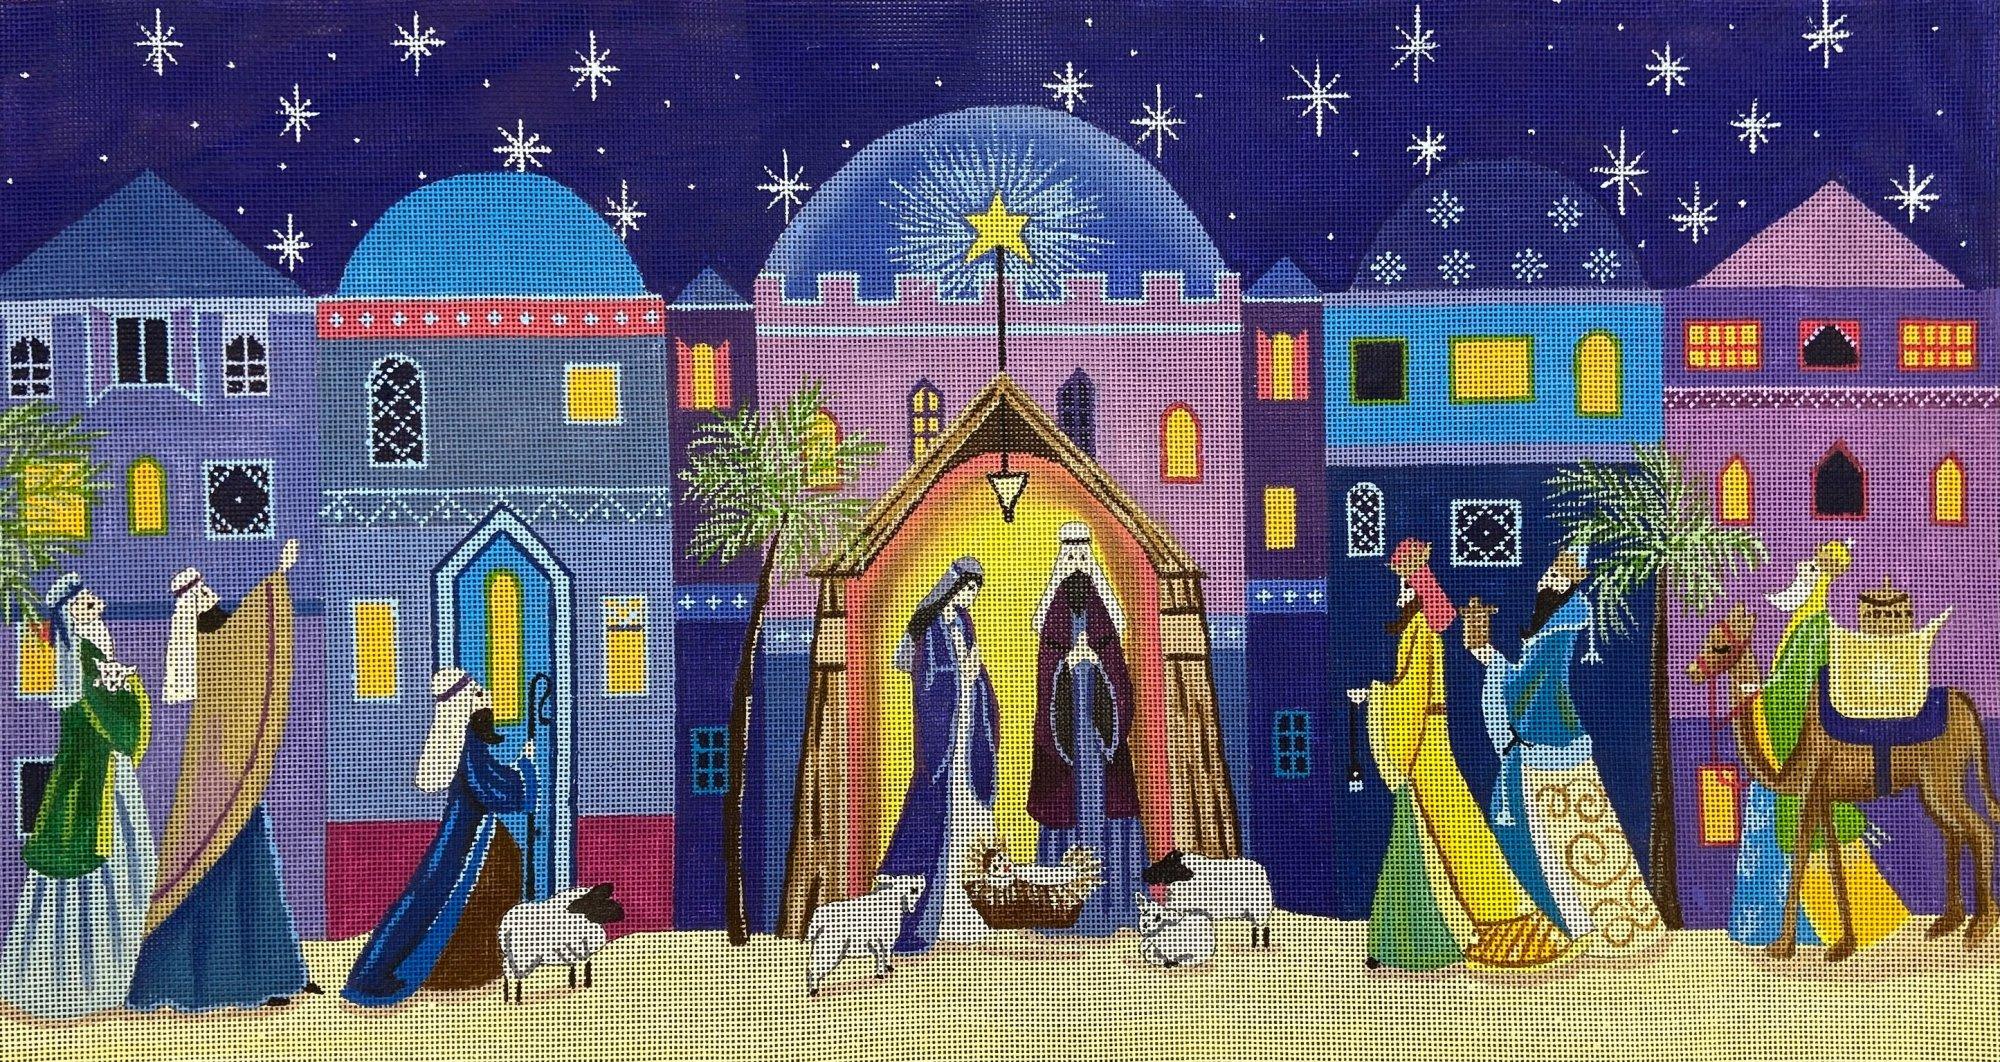 SS01 Bethlehem and Manger Love You More